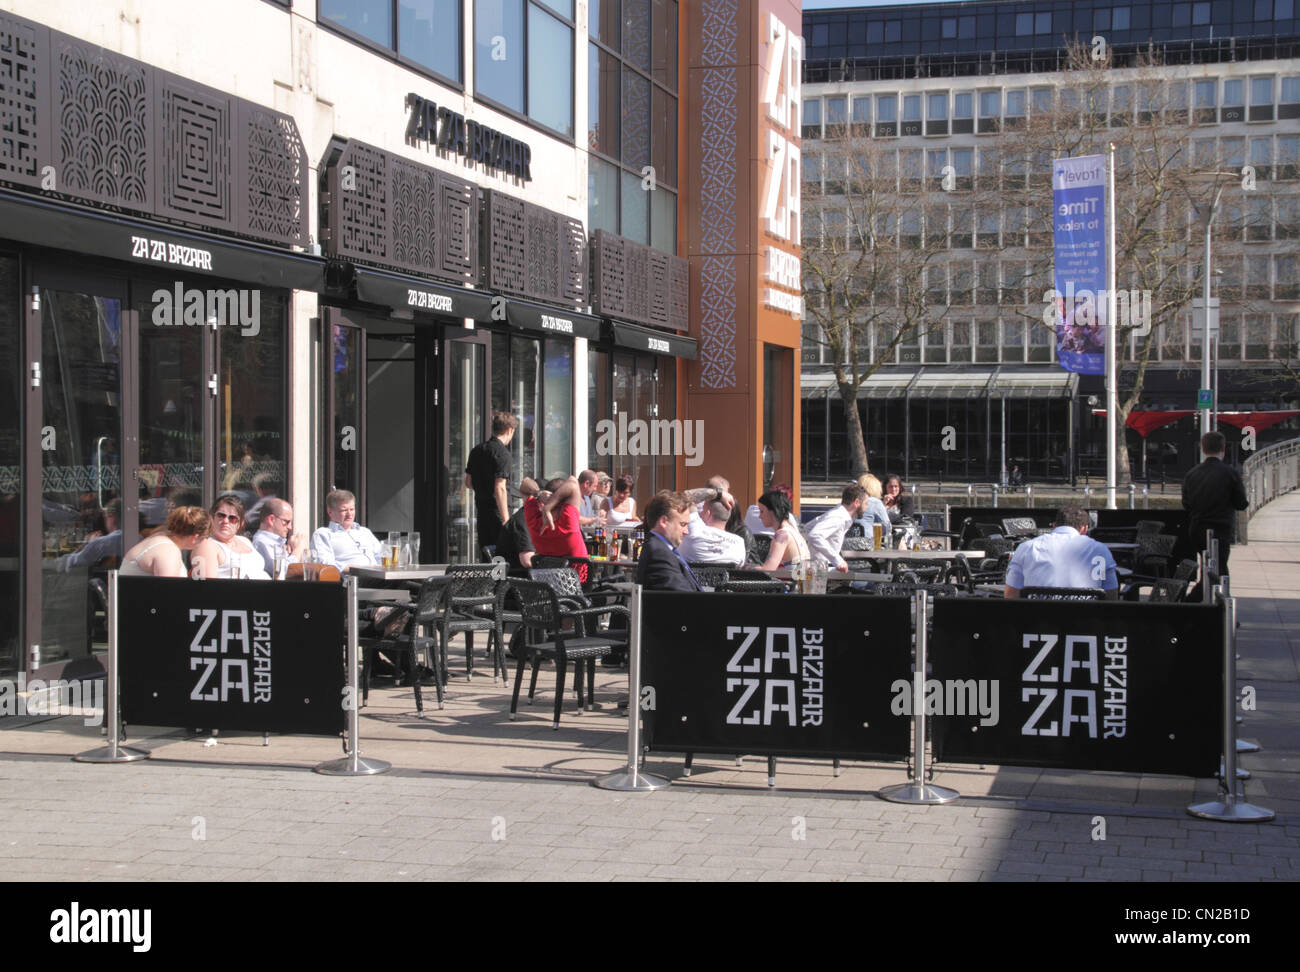 Za Za Bazaar Restaurant Bristol - Stock Image